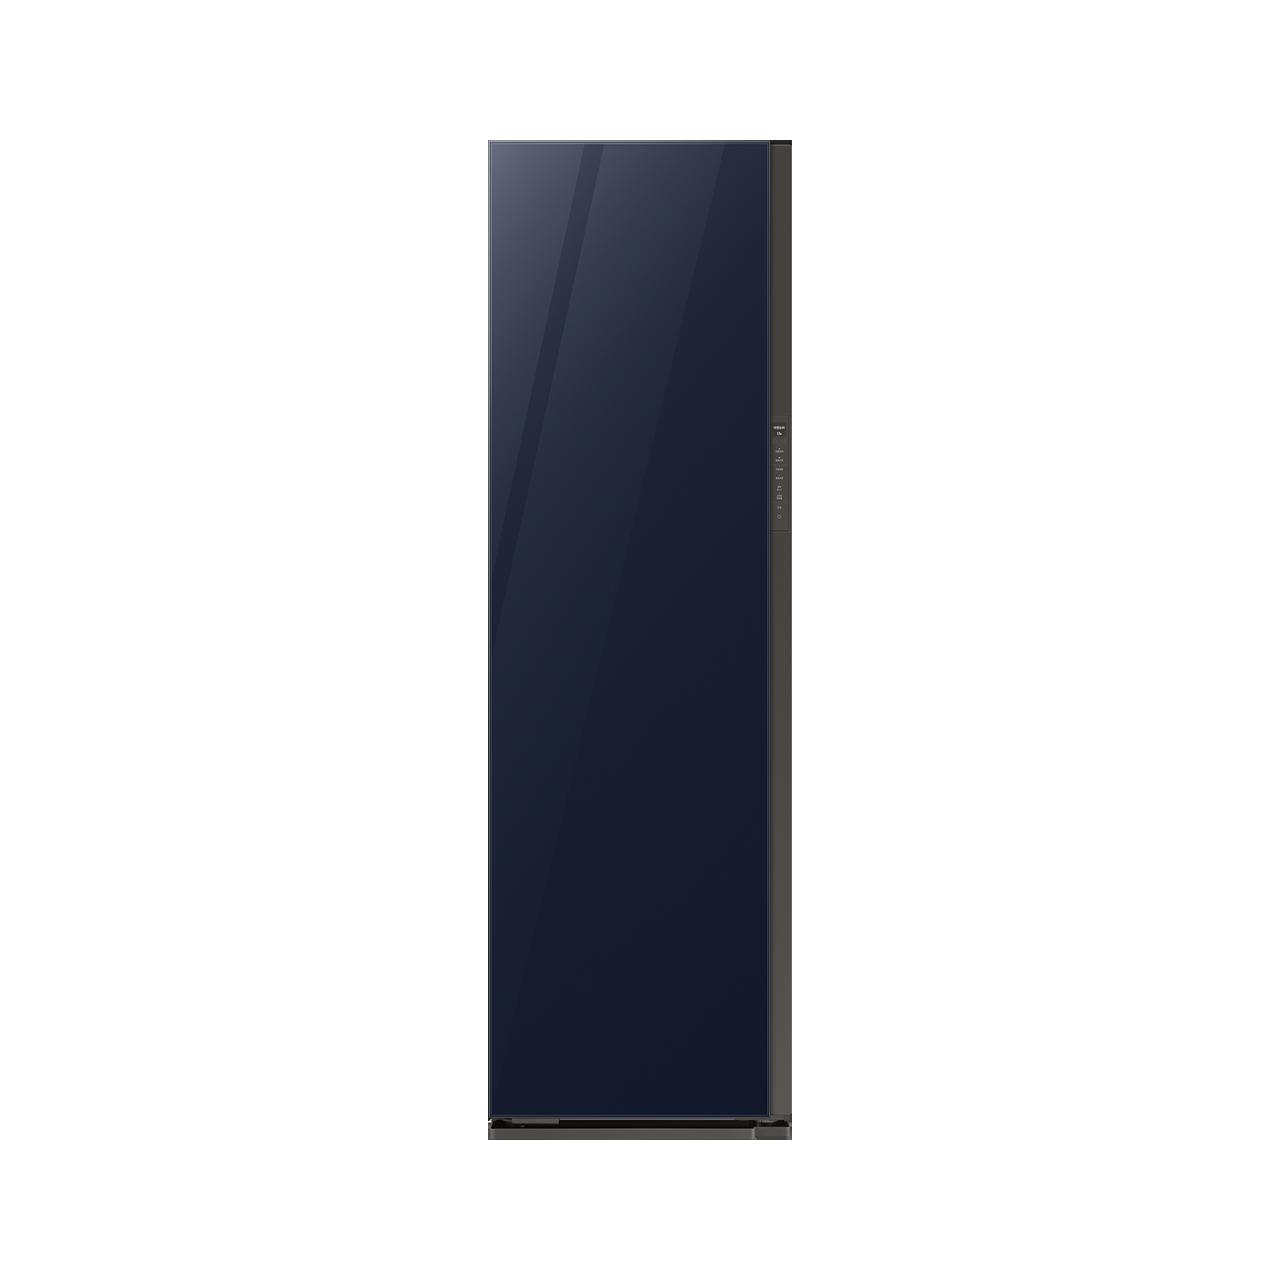 [Basic] 삼성 BESPOKE 에어드레서(5벌) SECDF10A95V0